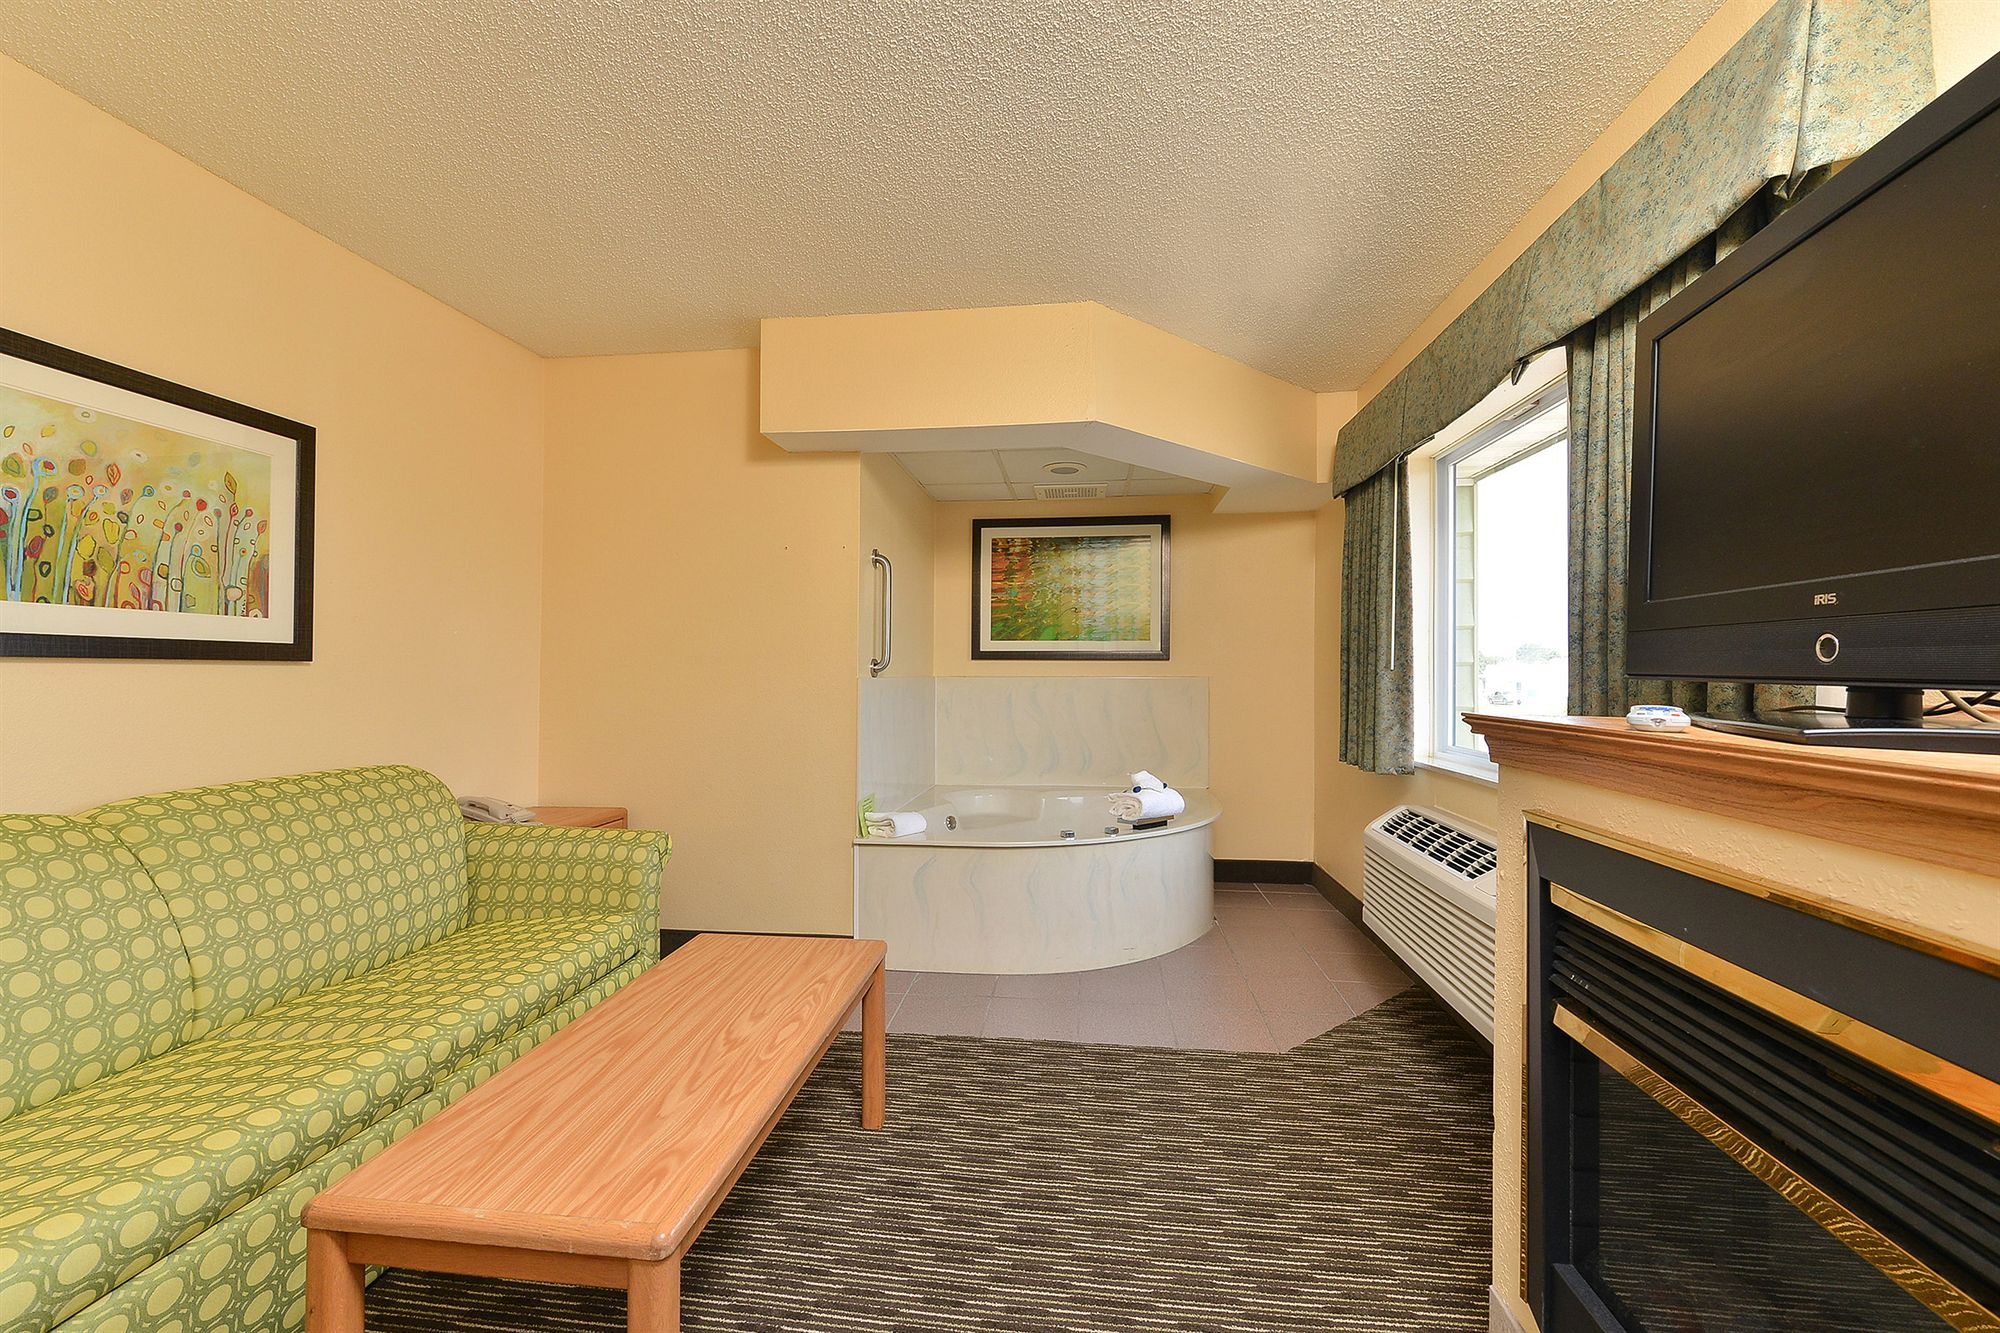 AmericInn Lodge & Suites Rehoboth Beach in Rehoboth Beach, DE